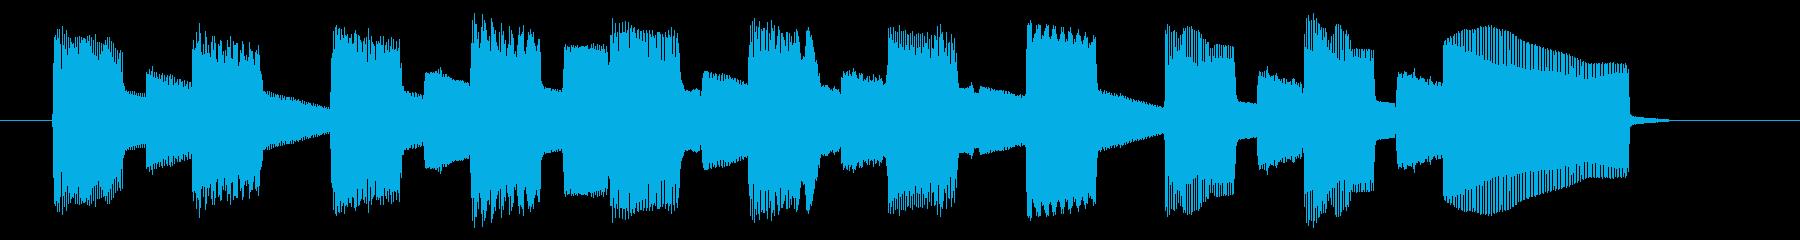 NES スポーツ A03-1(クリア1)の再生済みの波形